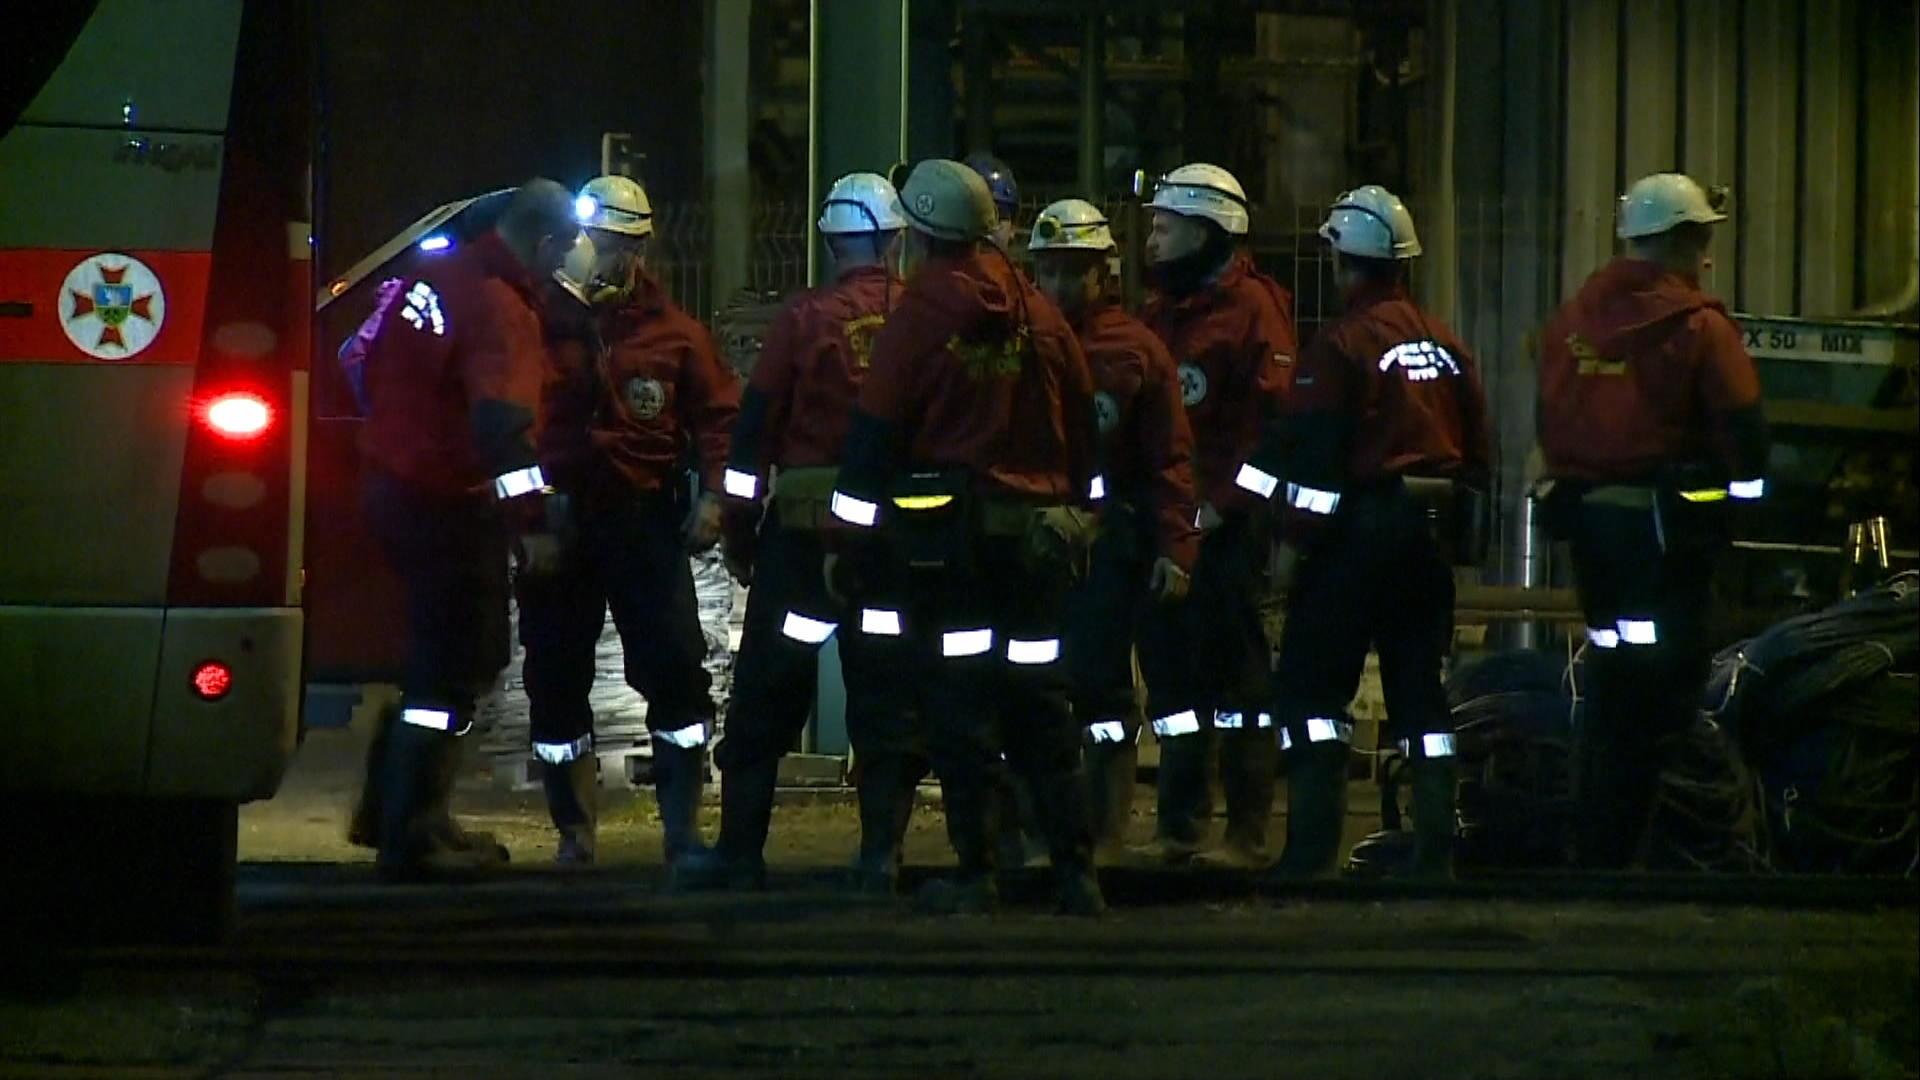 13 doda i kinesisk gruvolycka